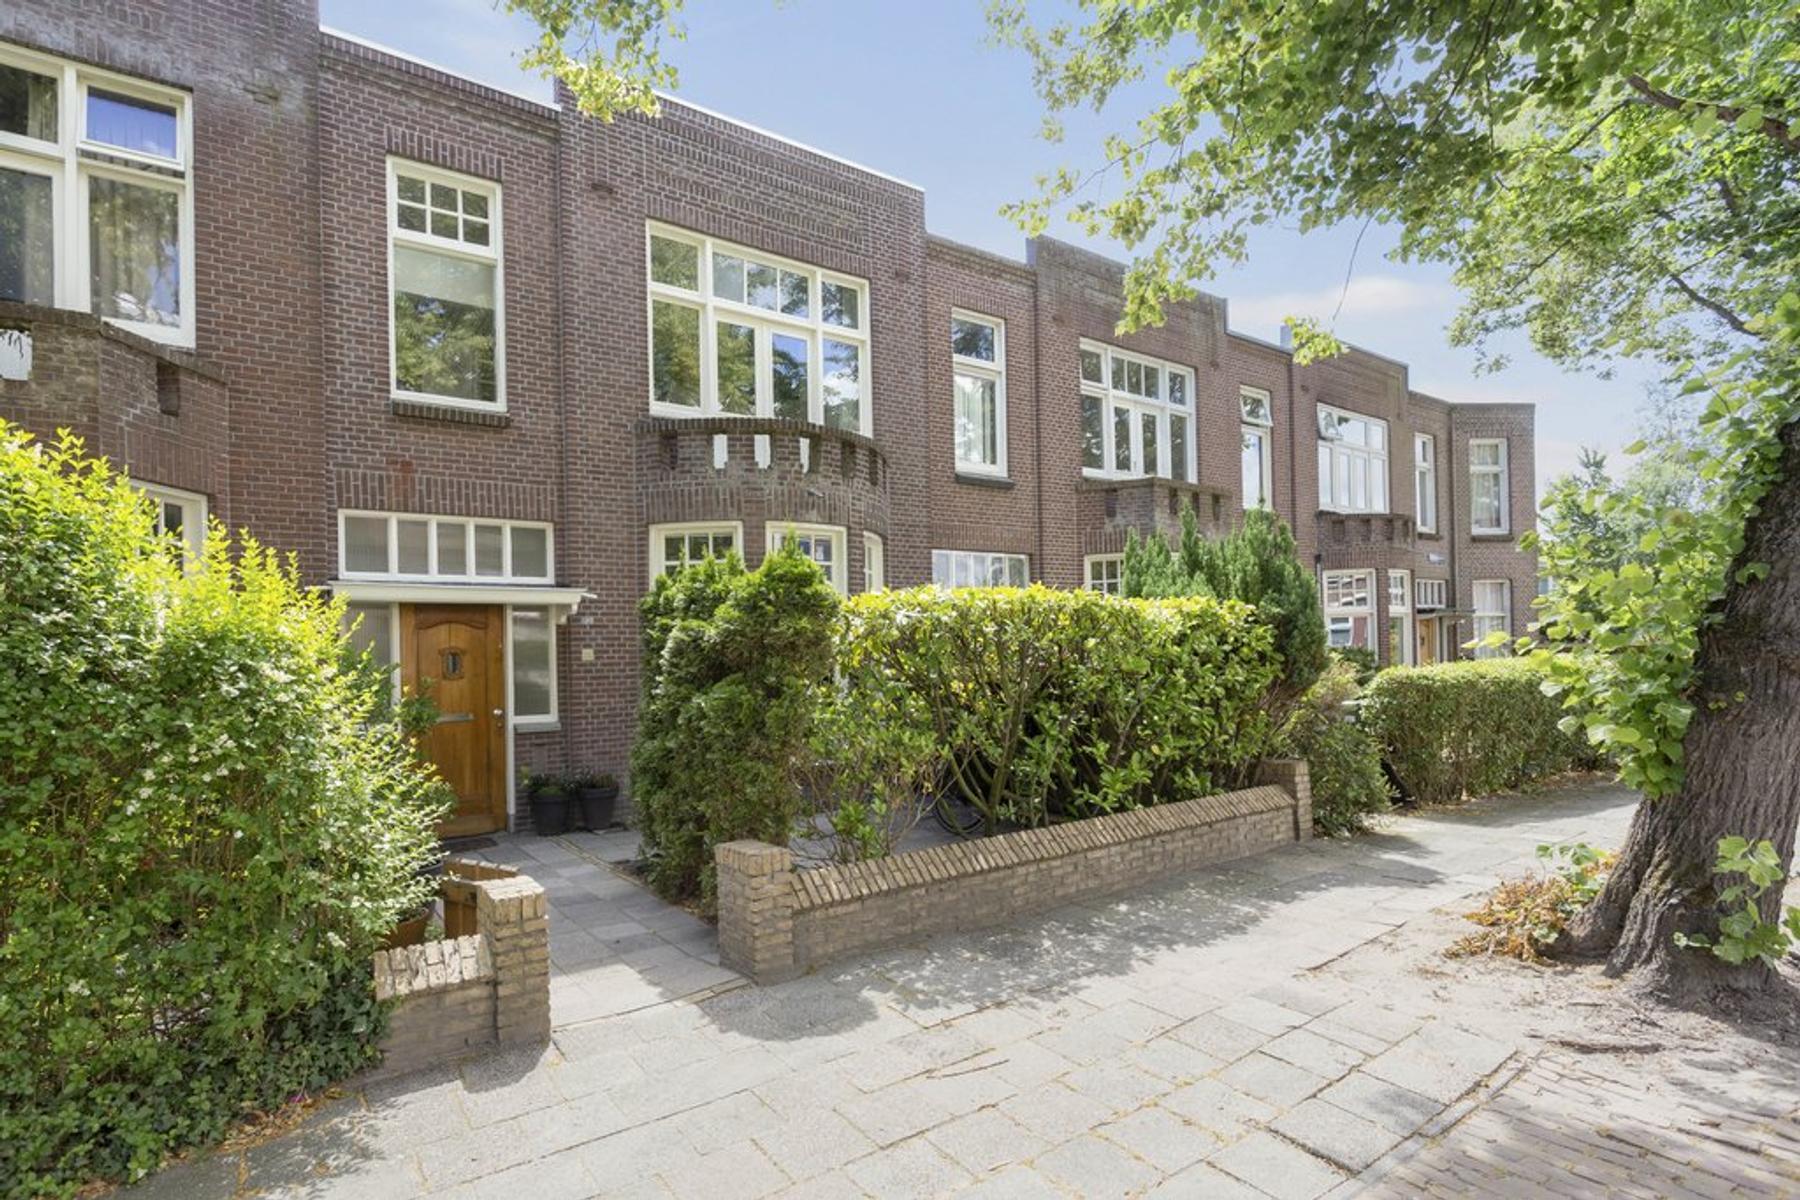 Leeuwerikstraat 15 in Leeuwarden 8917 ED